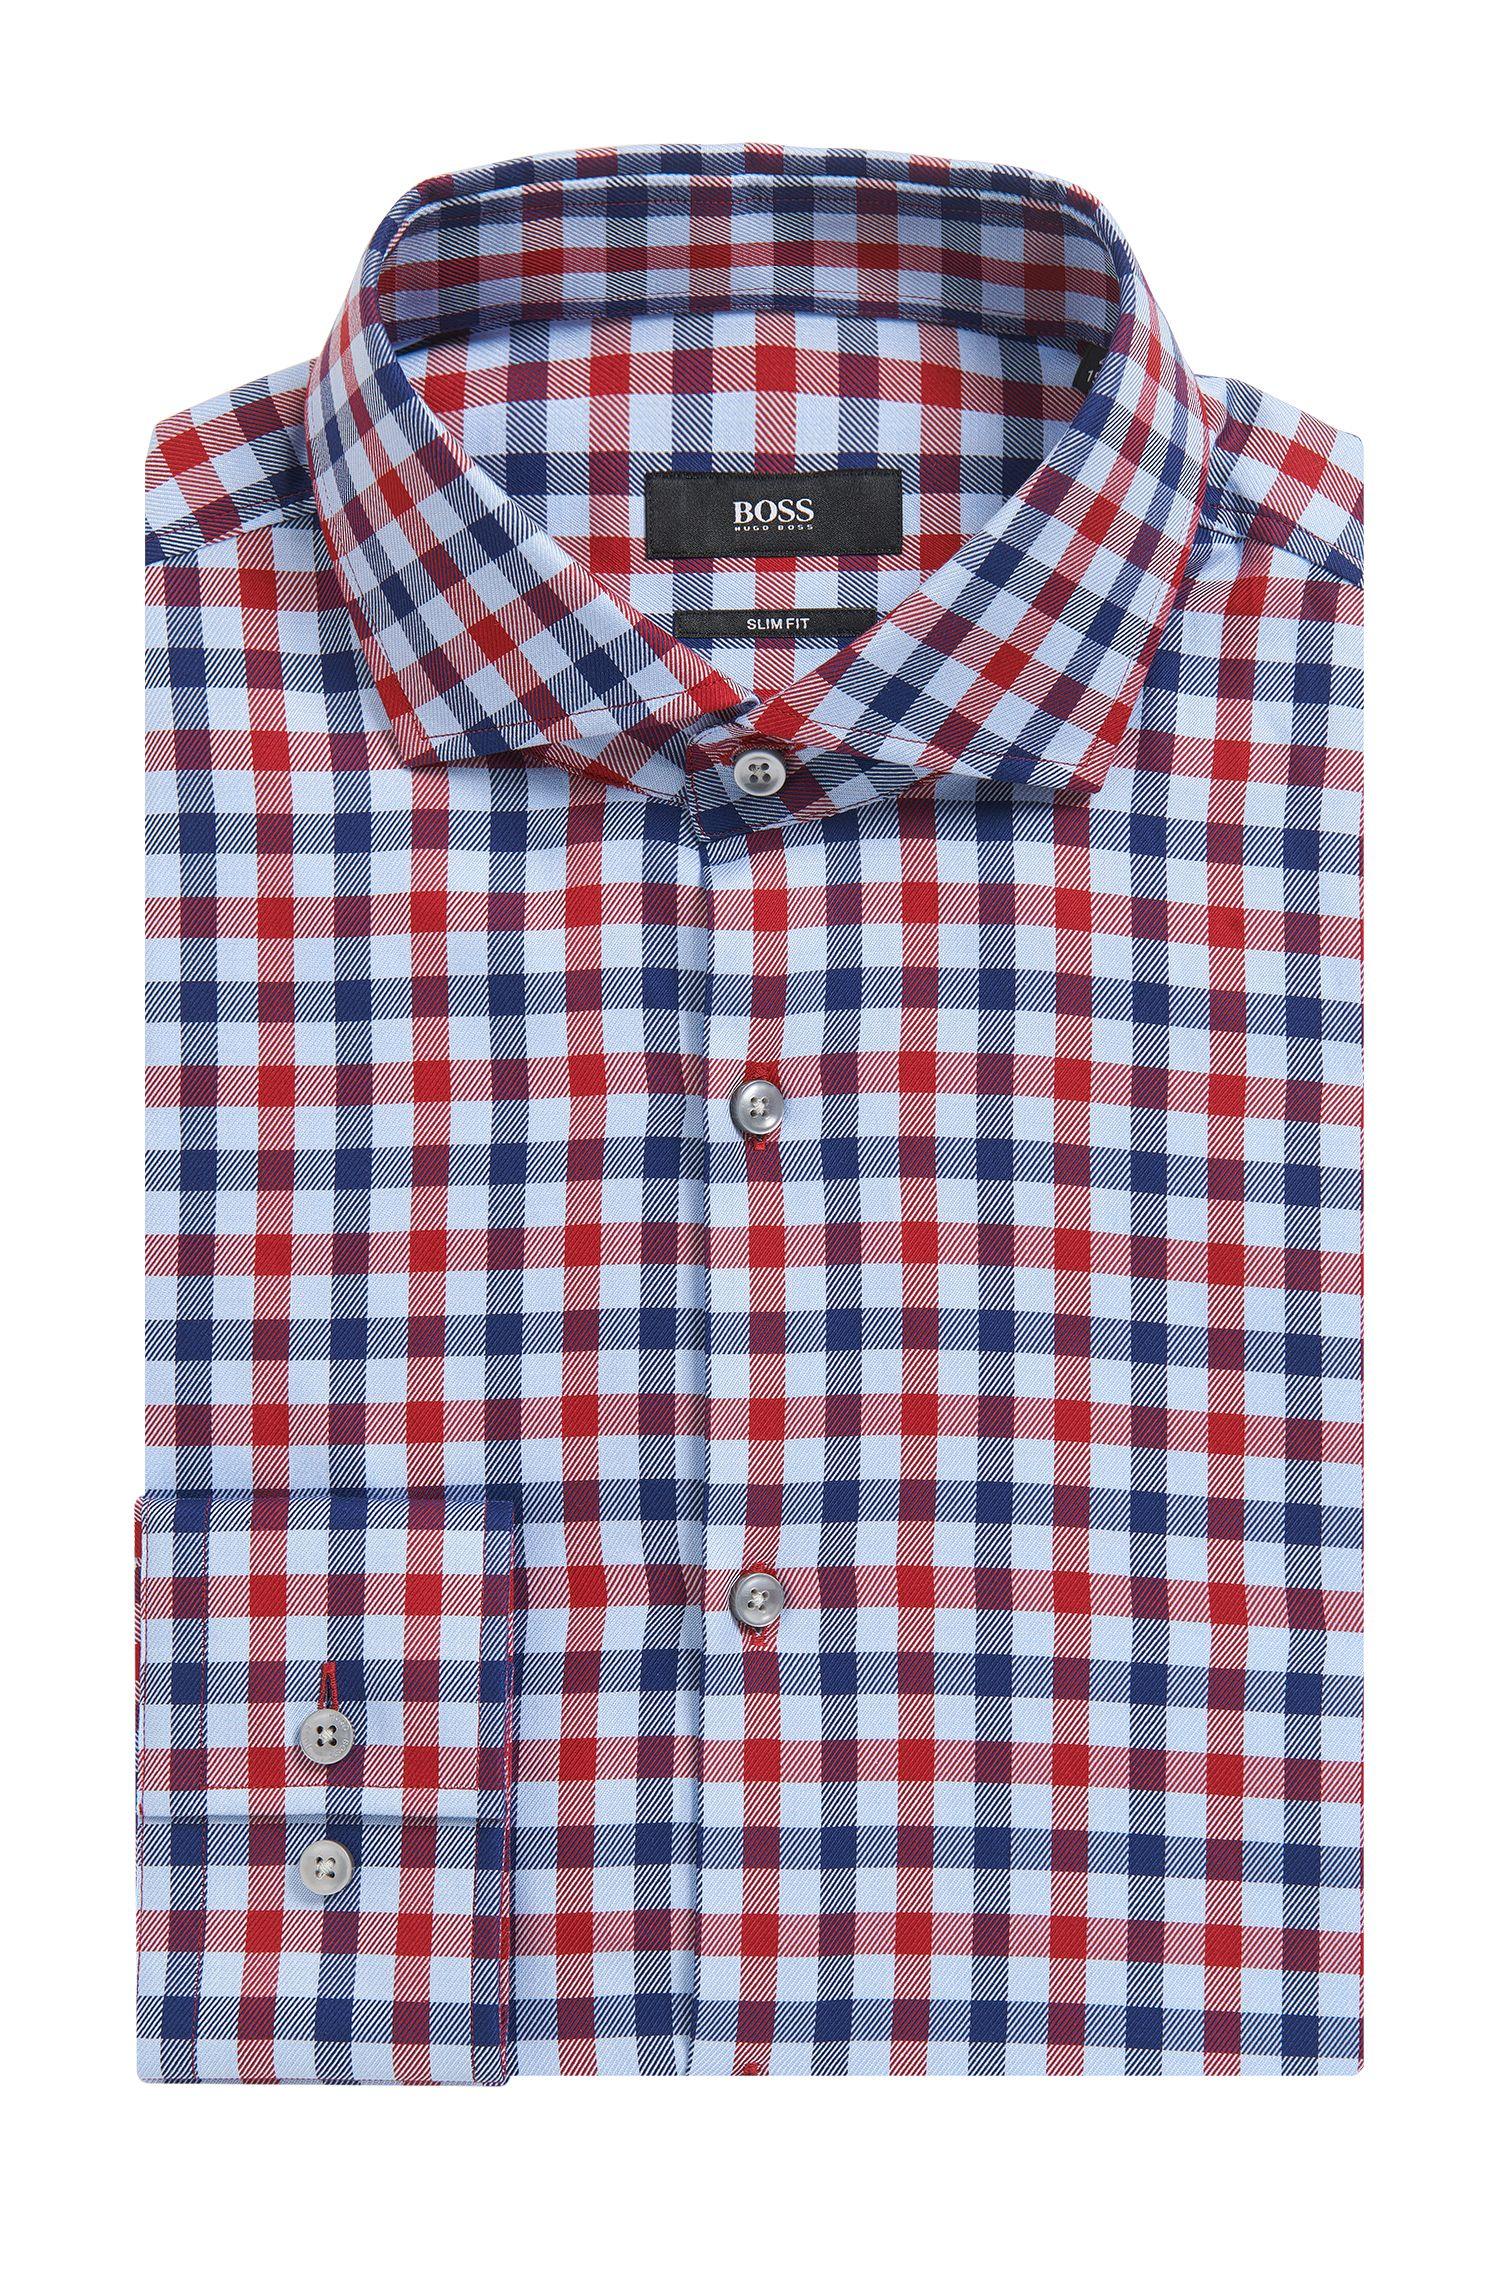 'Jason' | Slim Fit, Check Cotton Dress Shirt